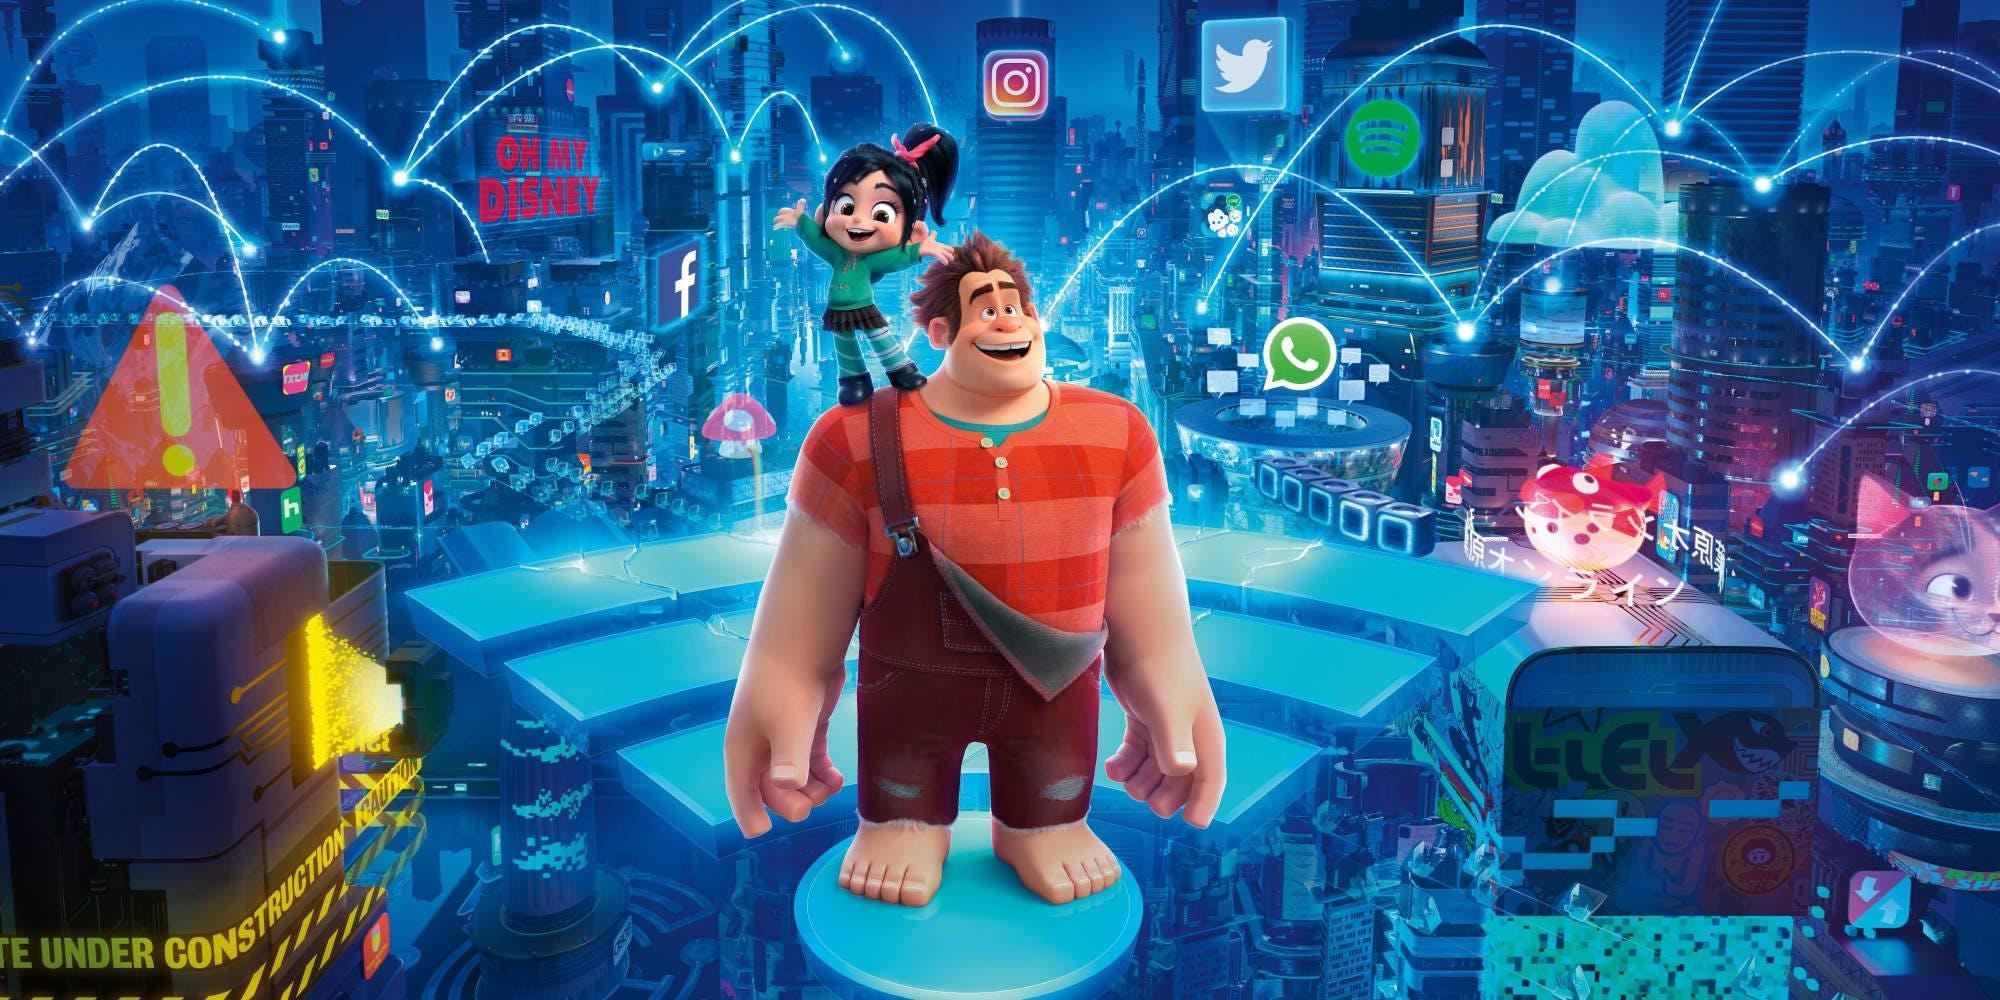 ralph-breaks-the-internet-movie-review.jpg (310.19 Kb)